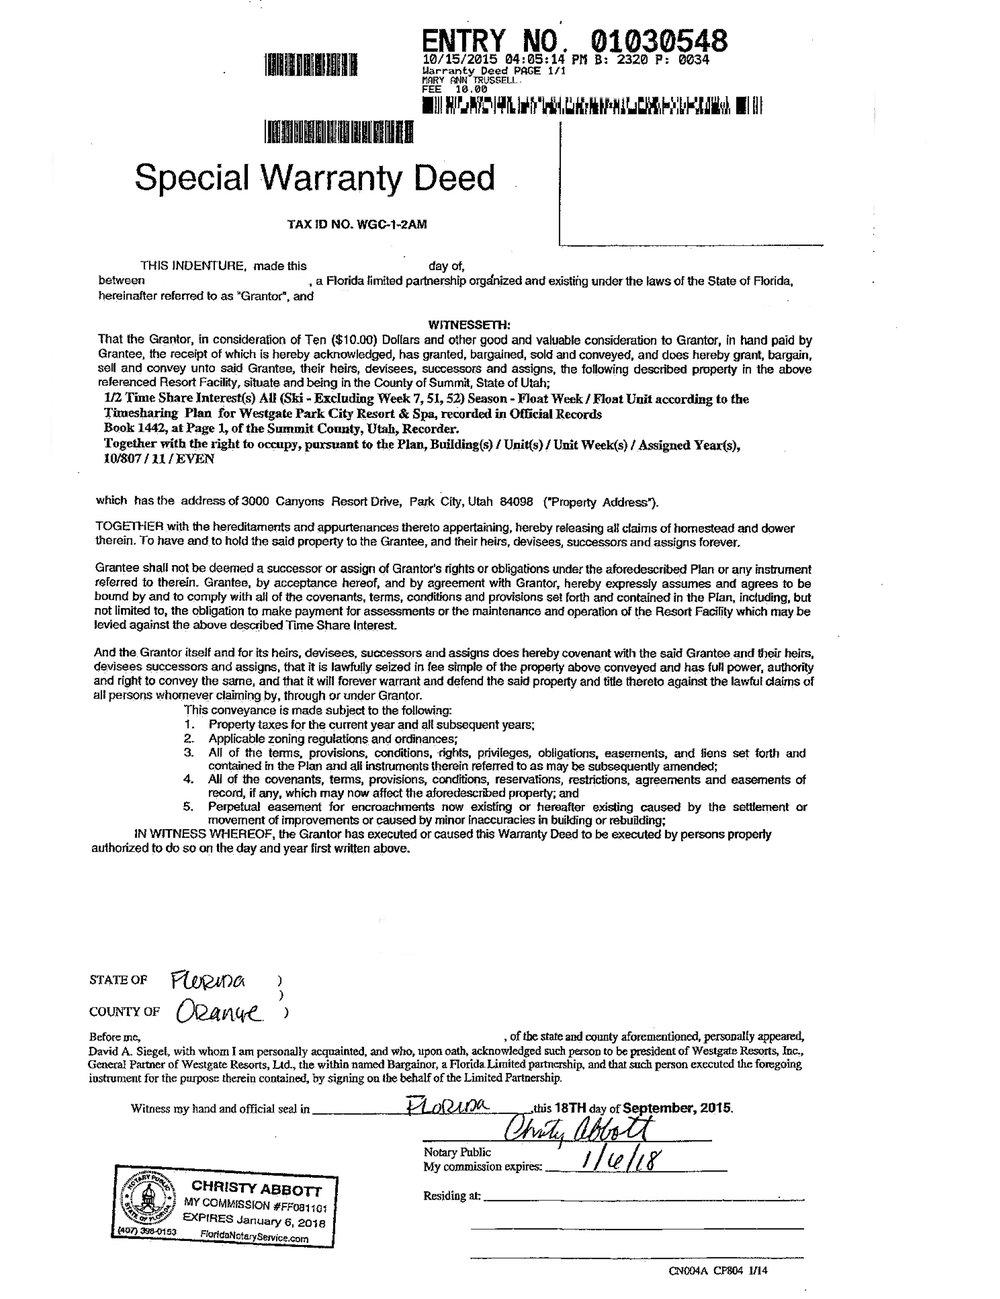 Warranty Deed Example.jpg